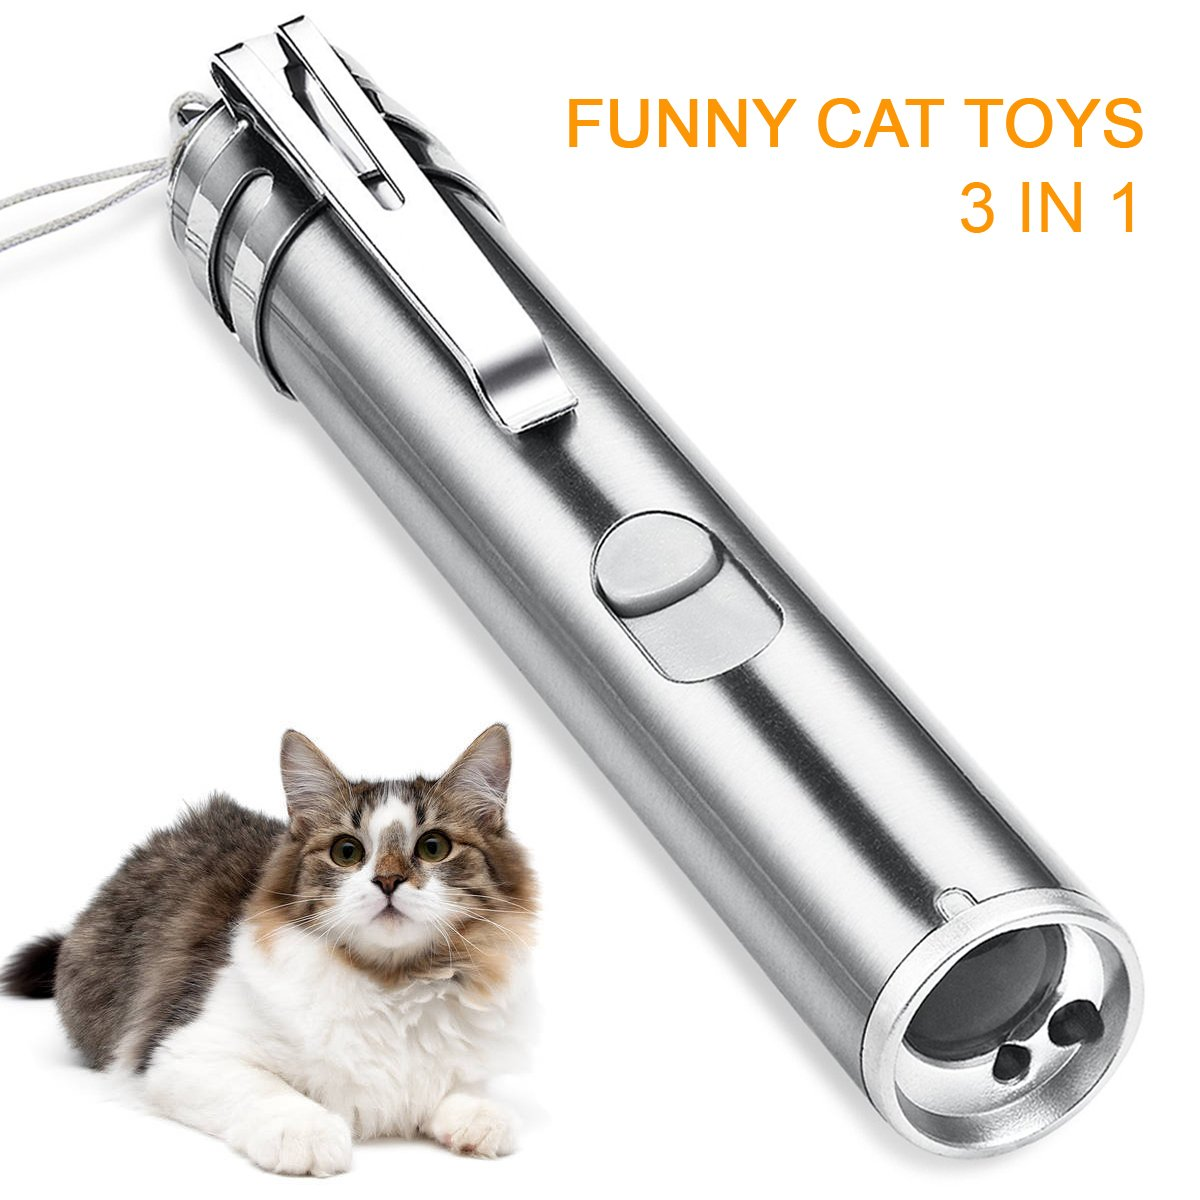 OKILA 3 in 1 Chaser Cat Toy Best Pet Cat LED Light Pointer Toys, Red Light and Flashlight UV Light Interactive LED Light Training Exercise Toy (USB Charging)